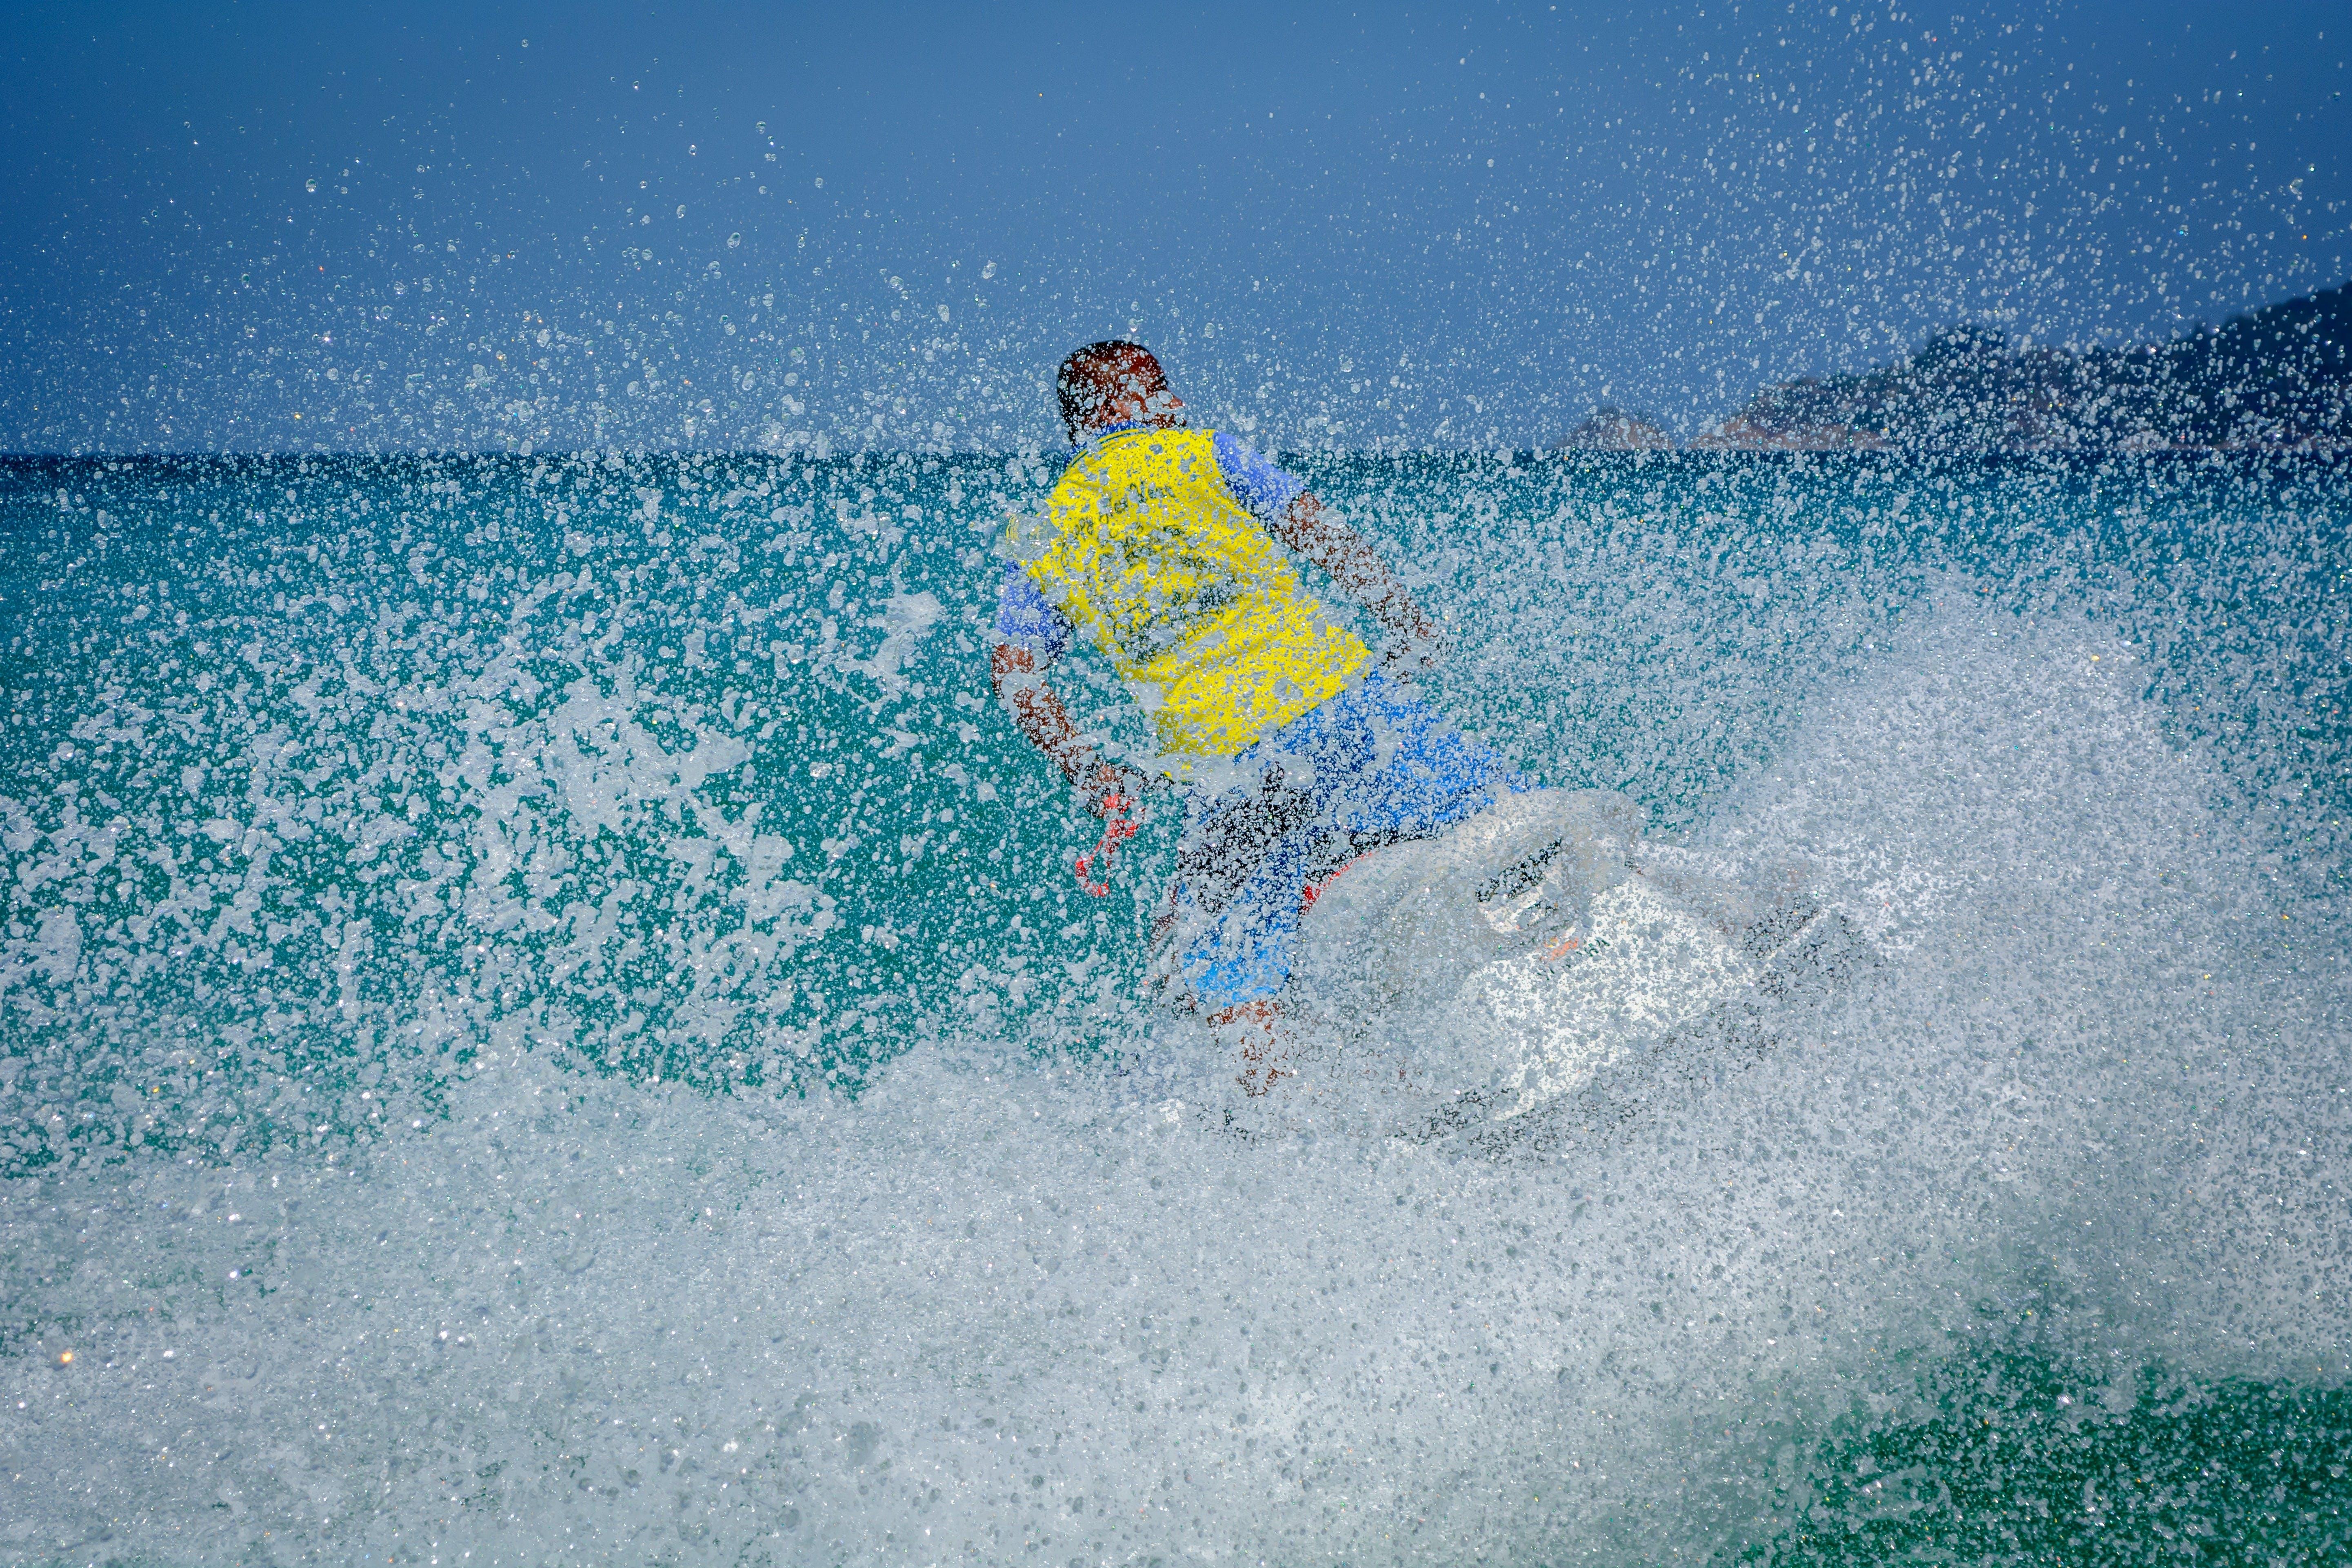 Man in Yellow Shirt Using Personal Watercraft